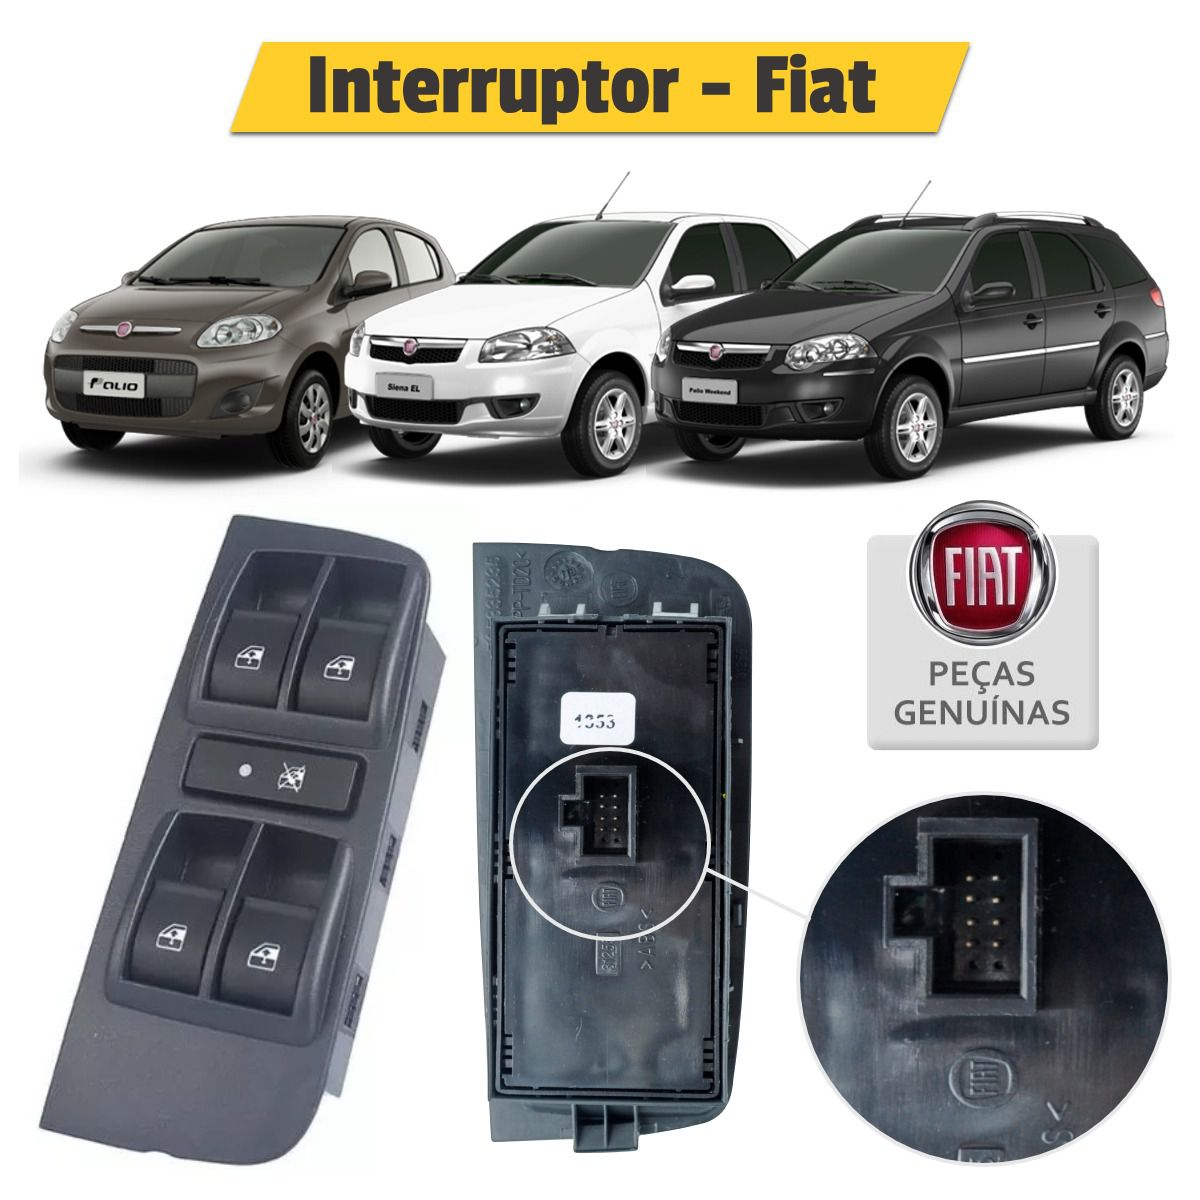 Interruptor Vidro Elétrico Quadruplo Motorista Fiat Pálio - Original